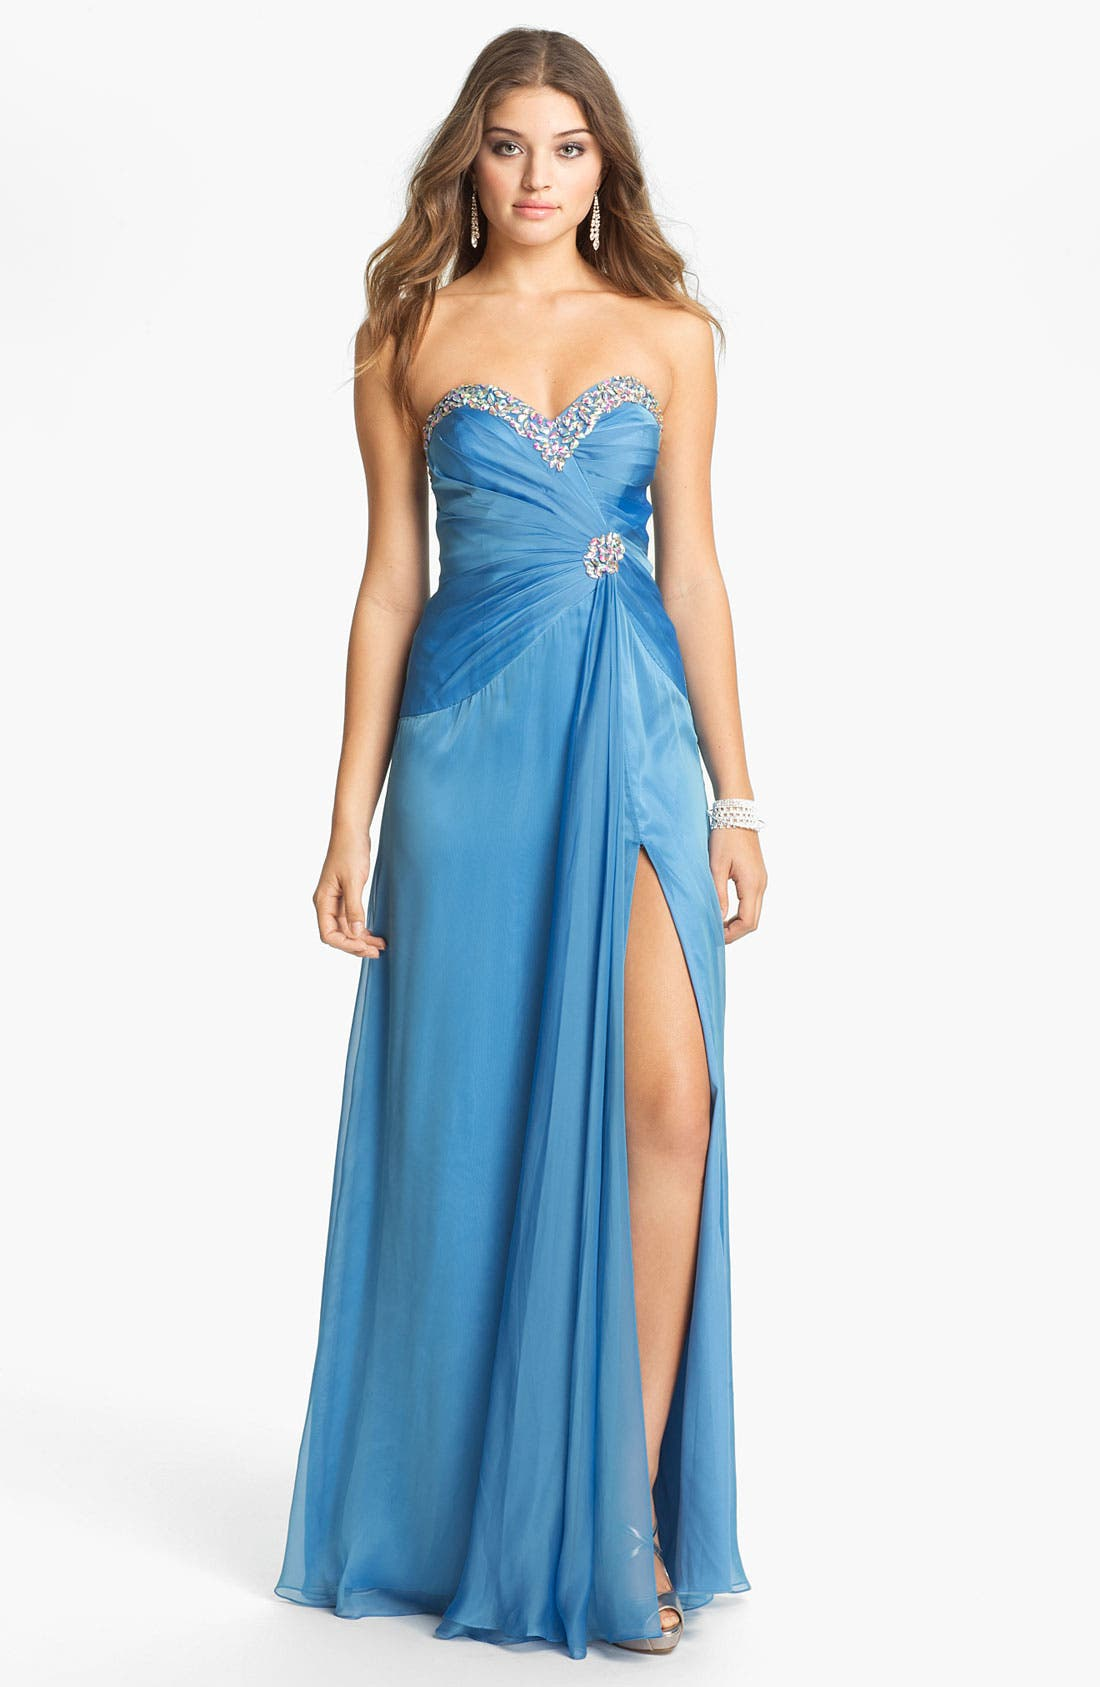 Main Image - Faviana Jeweled Sweetheart Silk Chiffon Gown (Online Only)